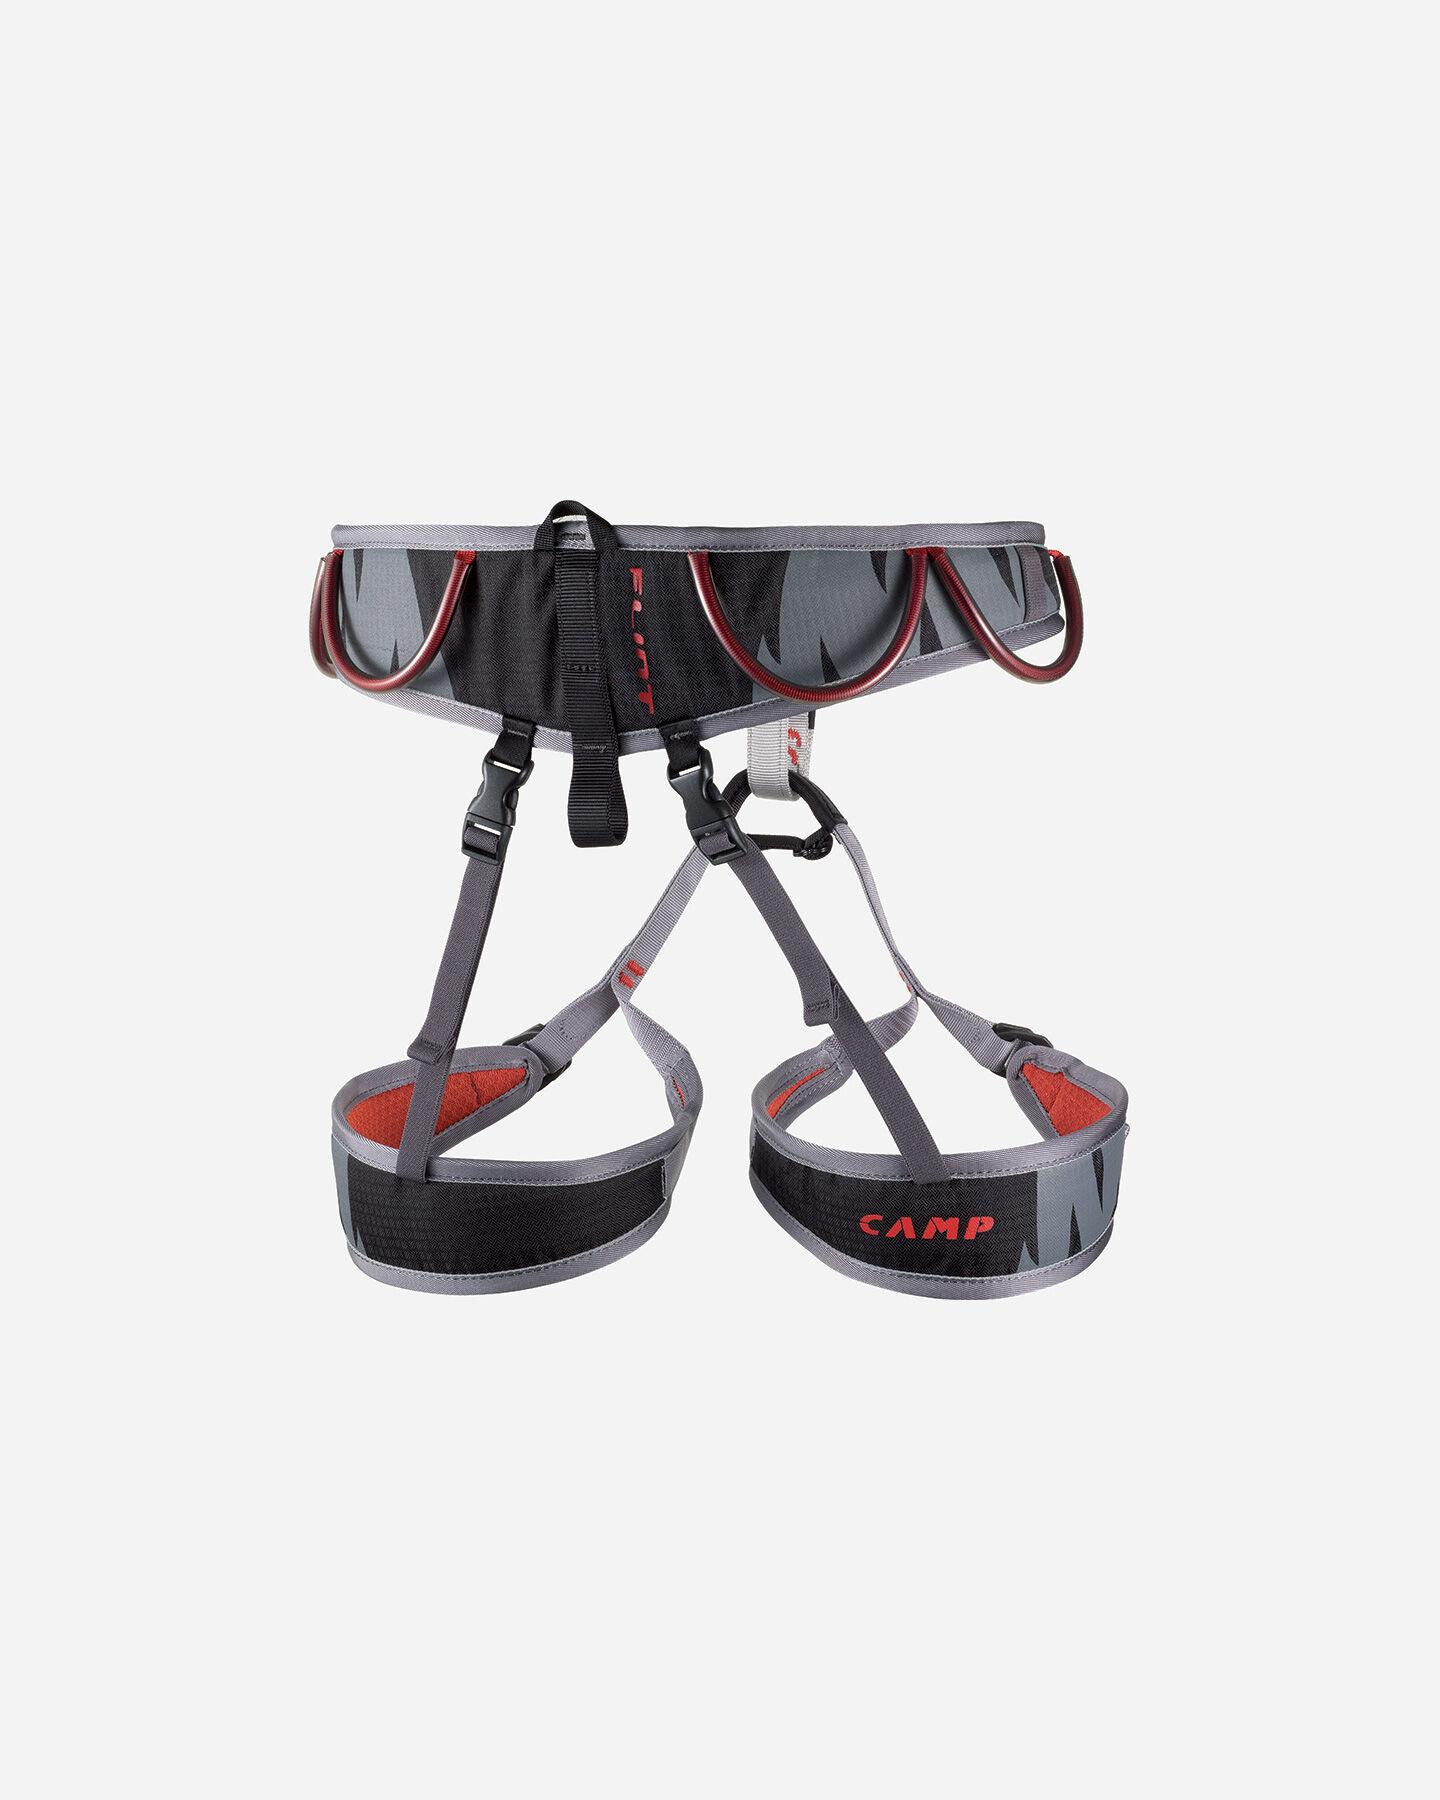 Imbragatura CAMP IMBRAGO CAMP FLINT II 205-1 S1282064 scatto 1